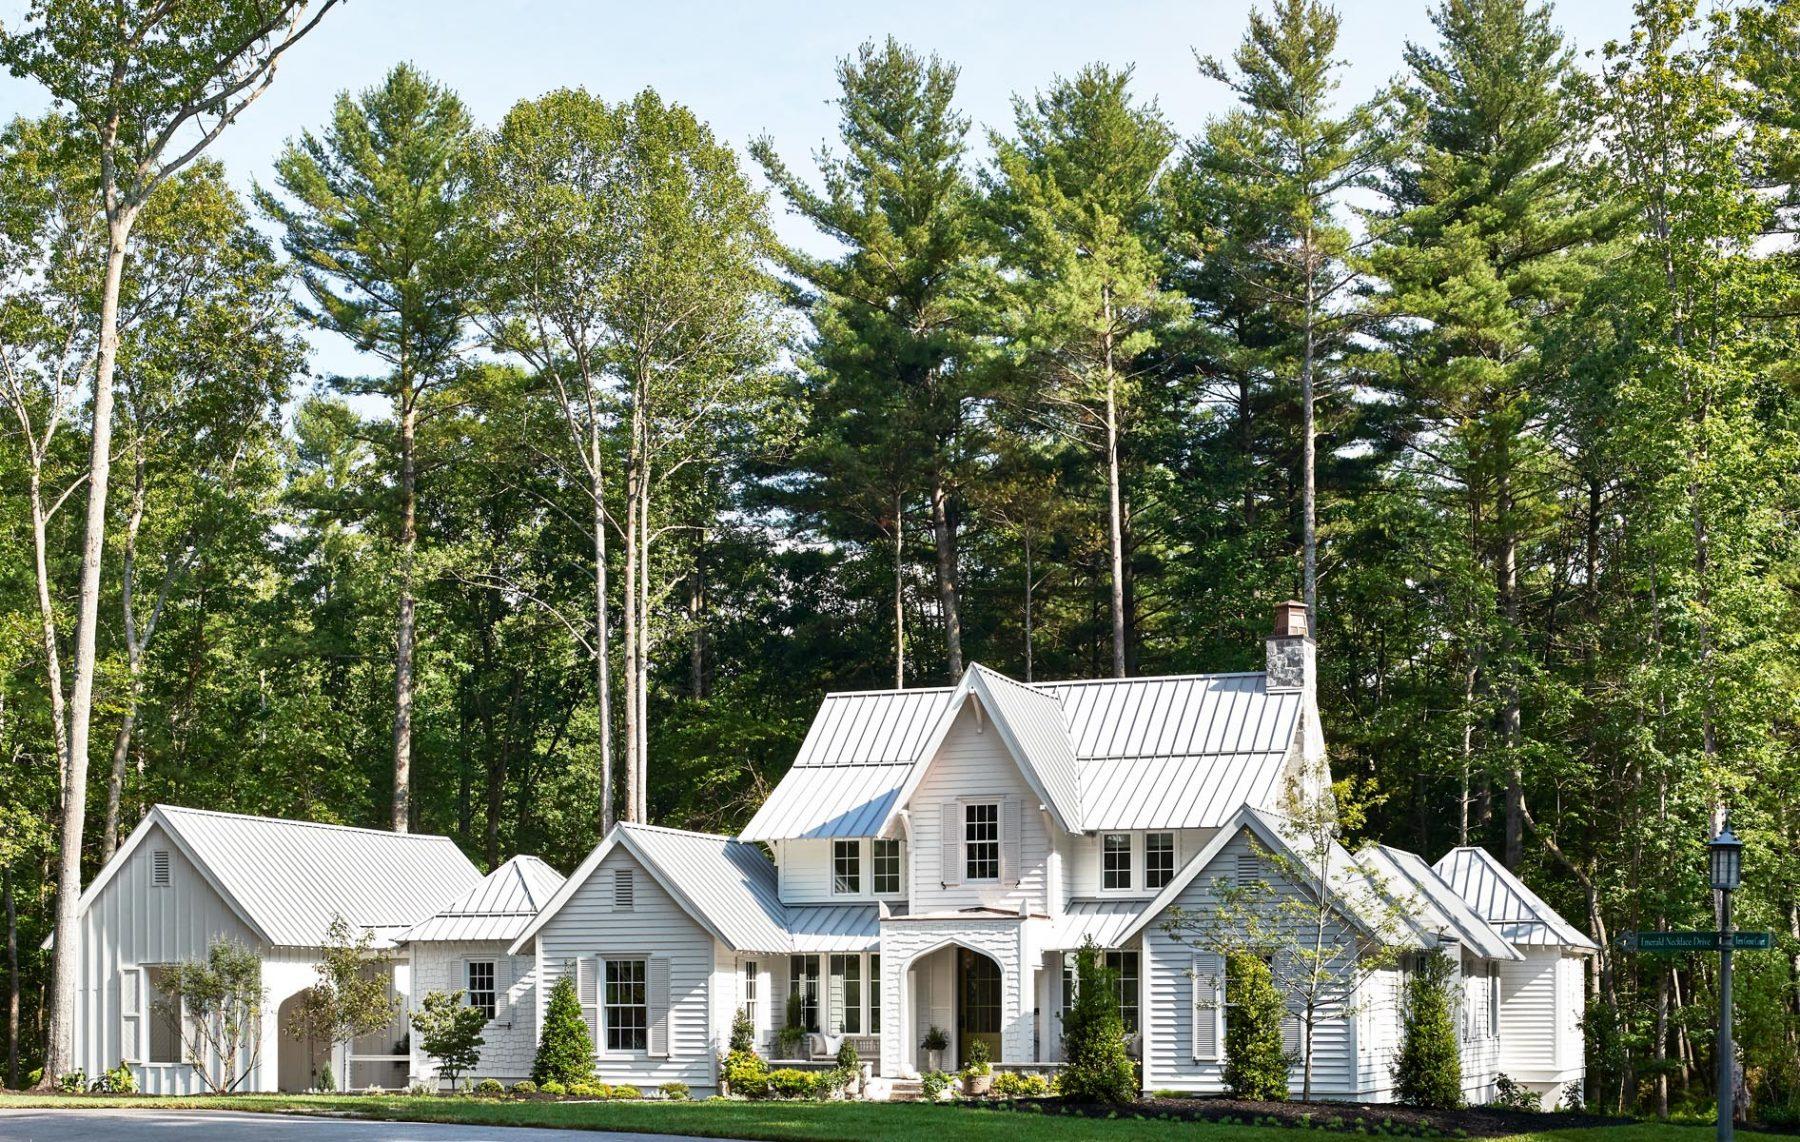 Buchanan Construction Builds the 2020 Southern Living Idea House